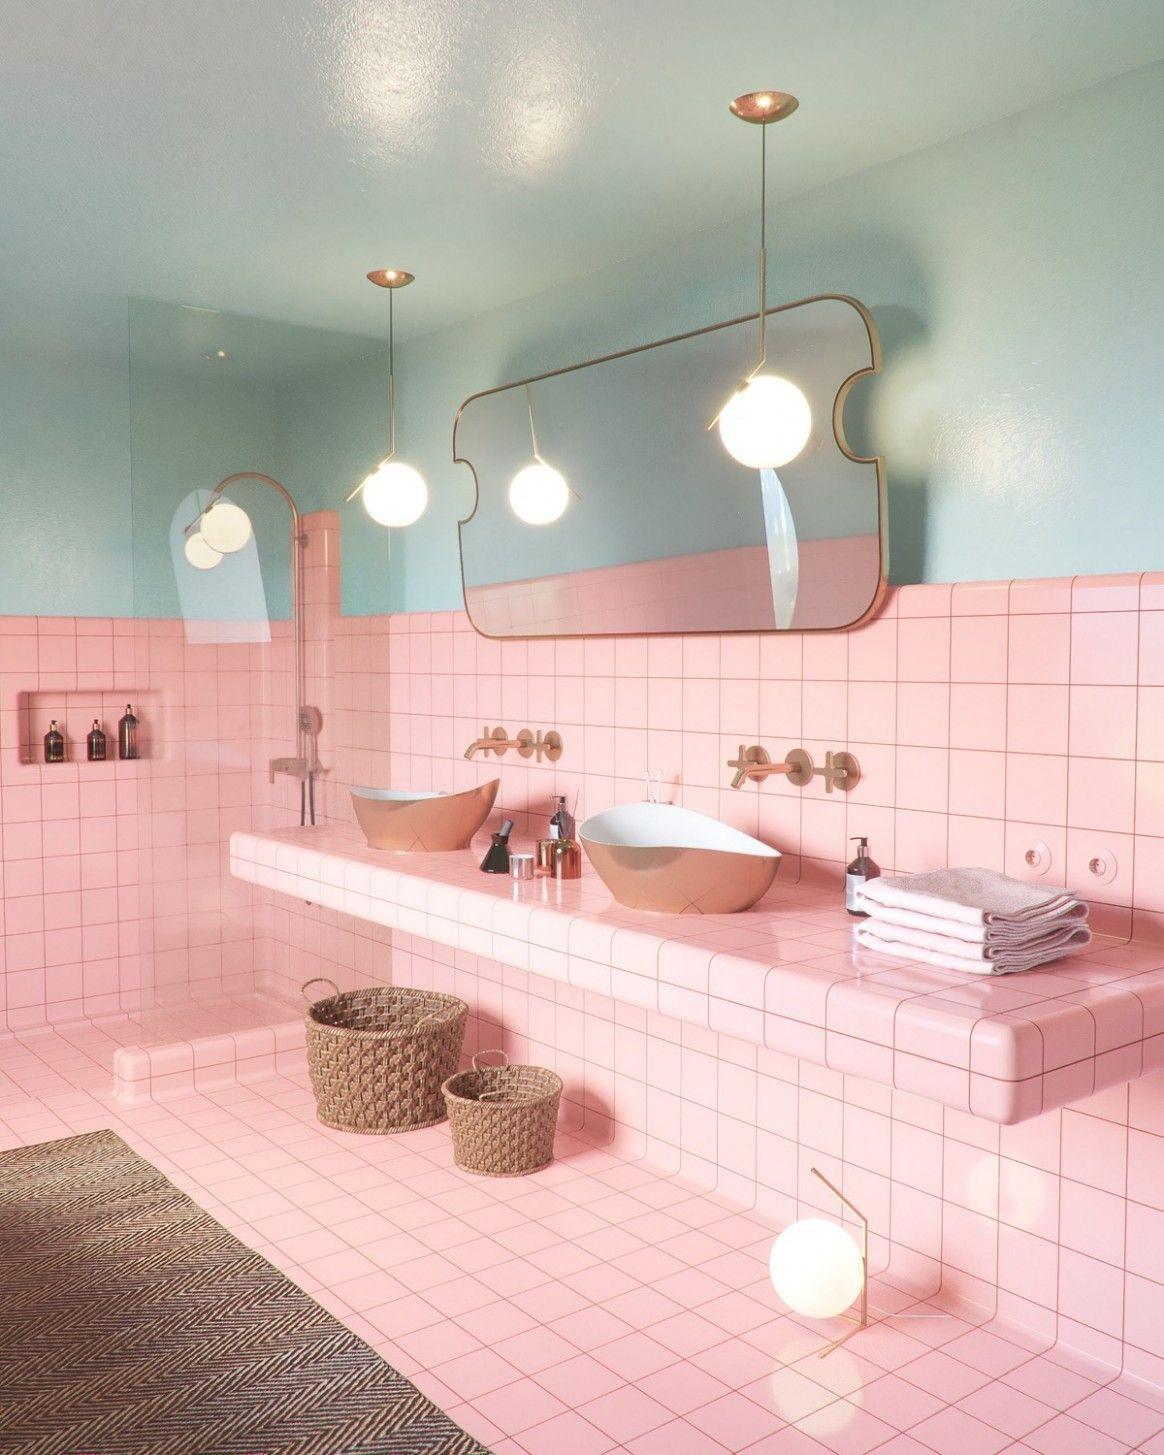 Paint Color Pink Bathroom Tile Bathroom Color Paint Pink Tile Bathroom Color Paint Pink Tile In 2020 Pink Bathroom Tiles Ensuite Bathroom Designs Pink Bathroom